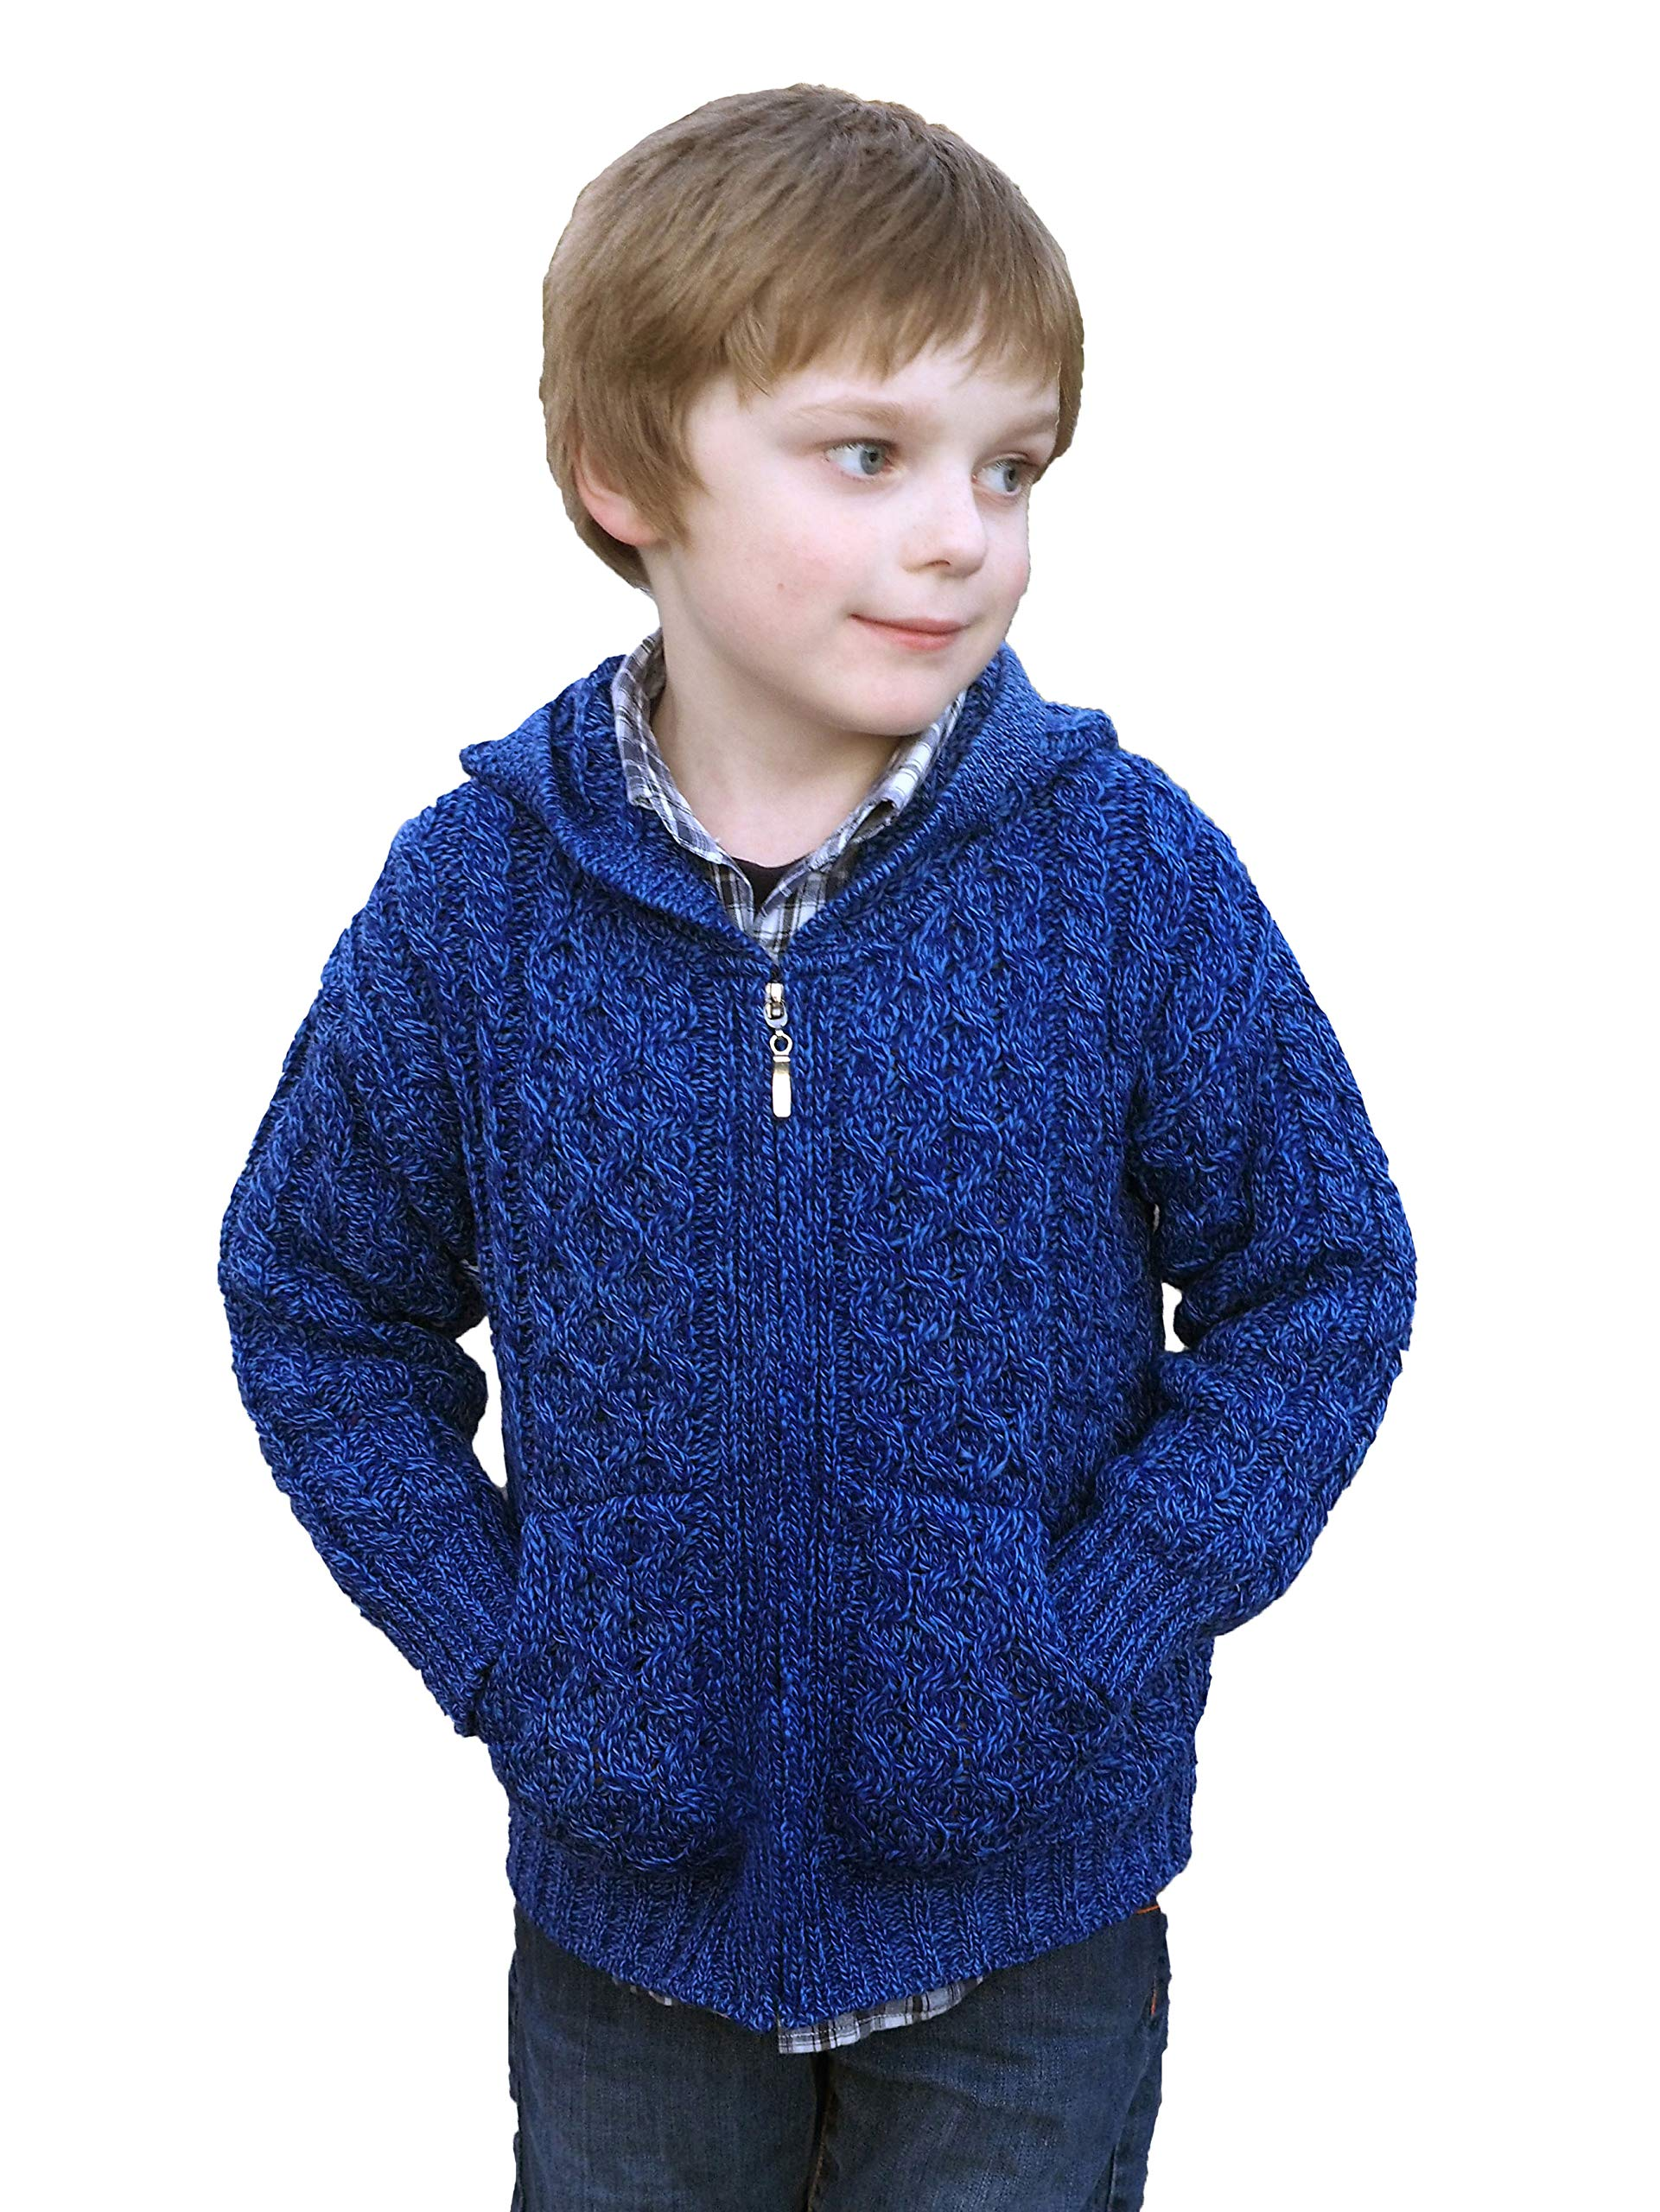 Aran Crafts Hooded Cardigan Sweater 4/5 Marl Blue (HD4039-4/5-BLU)